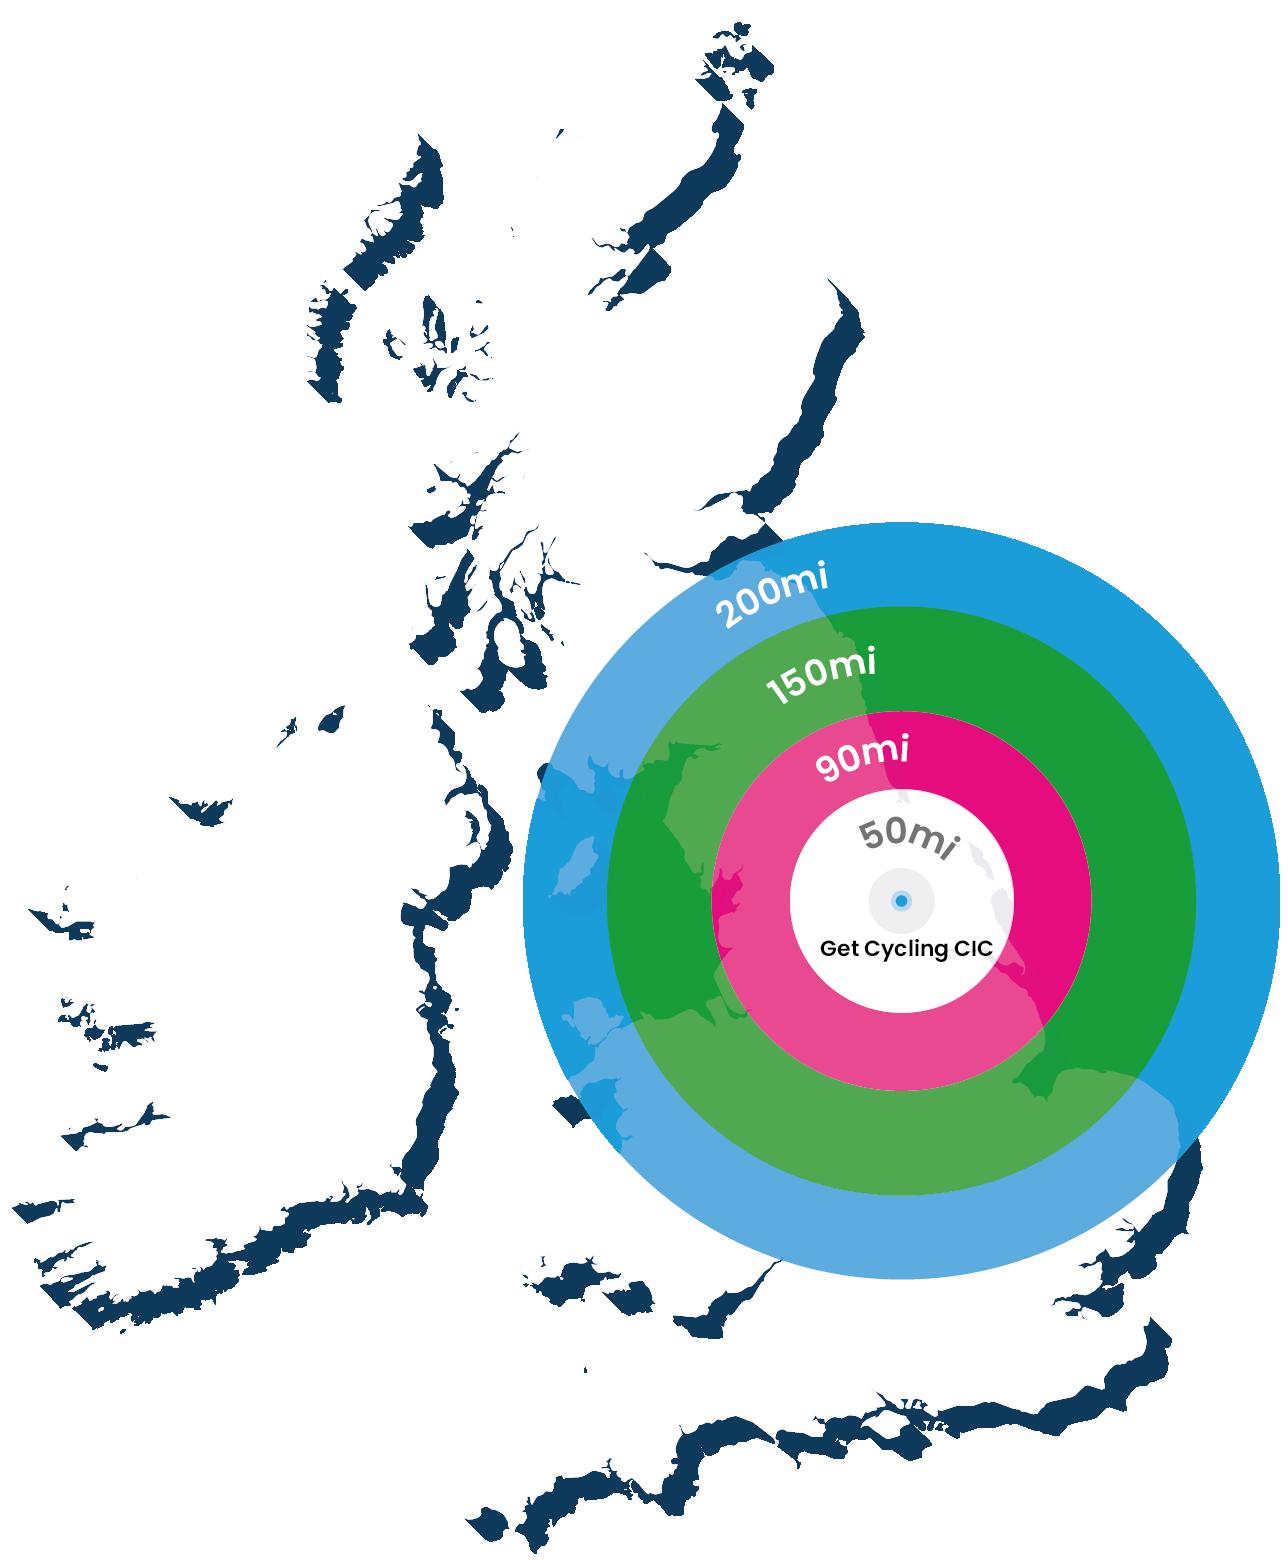 get-cycling-radius-map